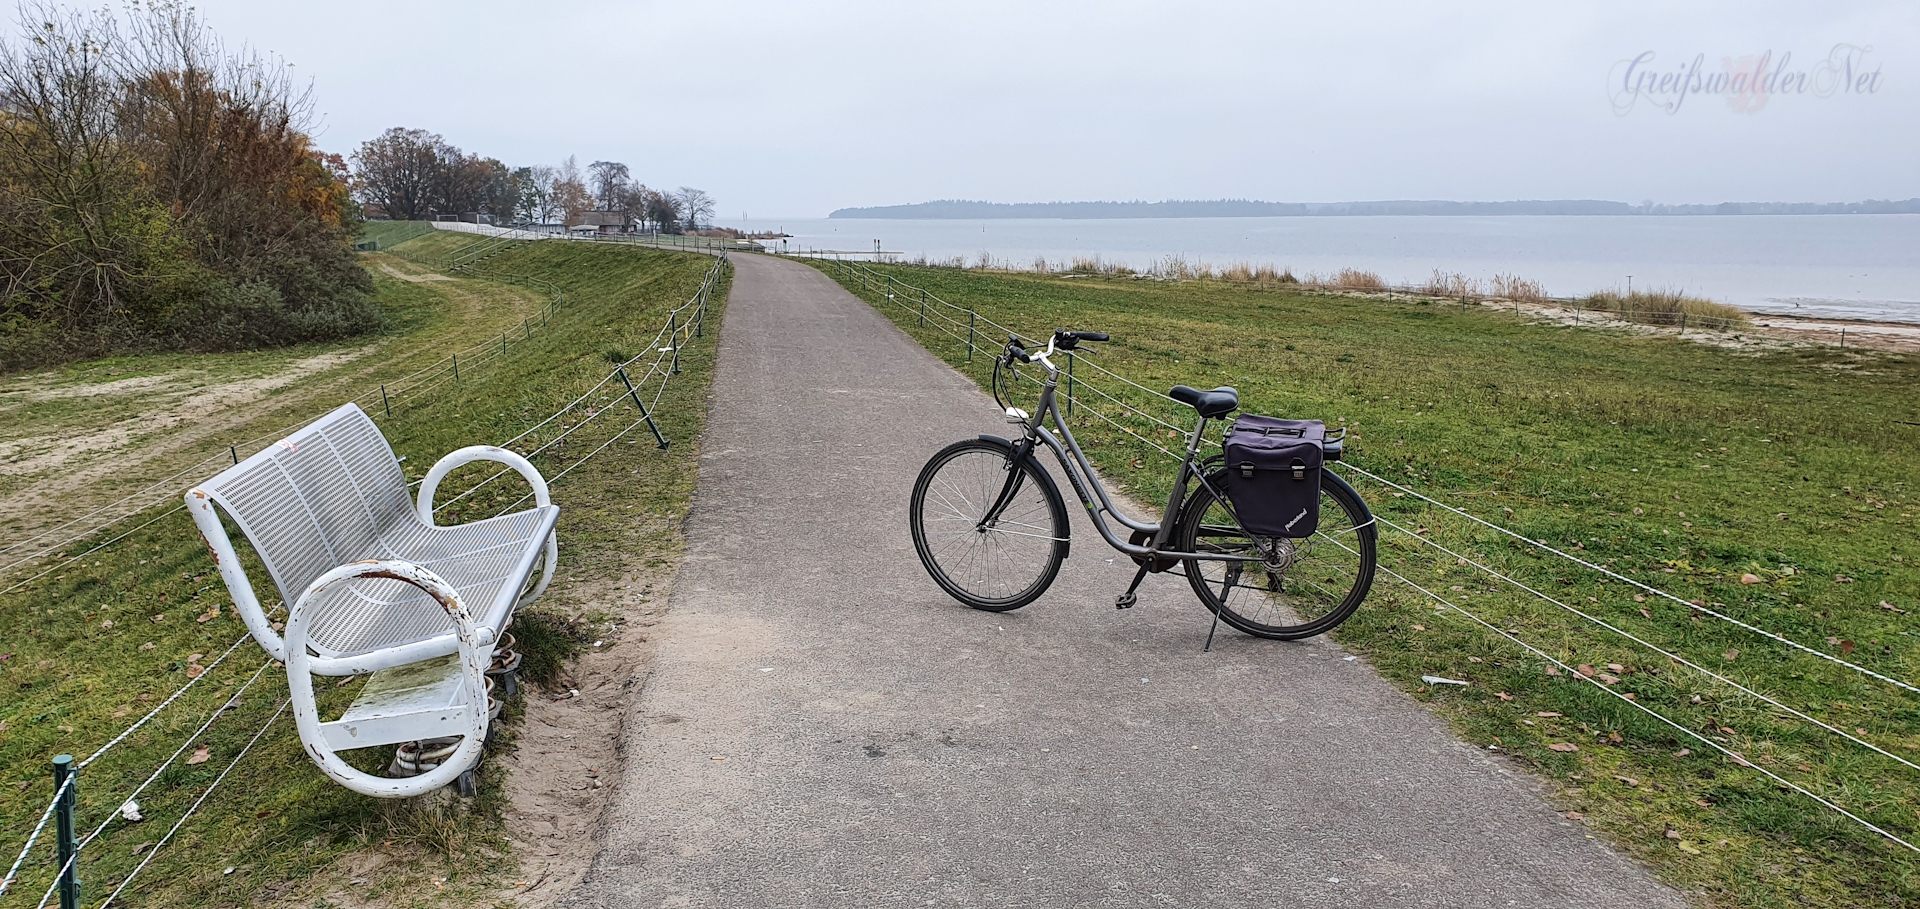 Pause - Strand in Greifswald-Eldena